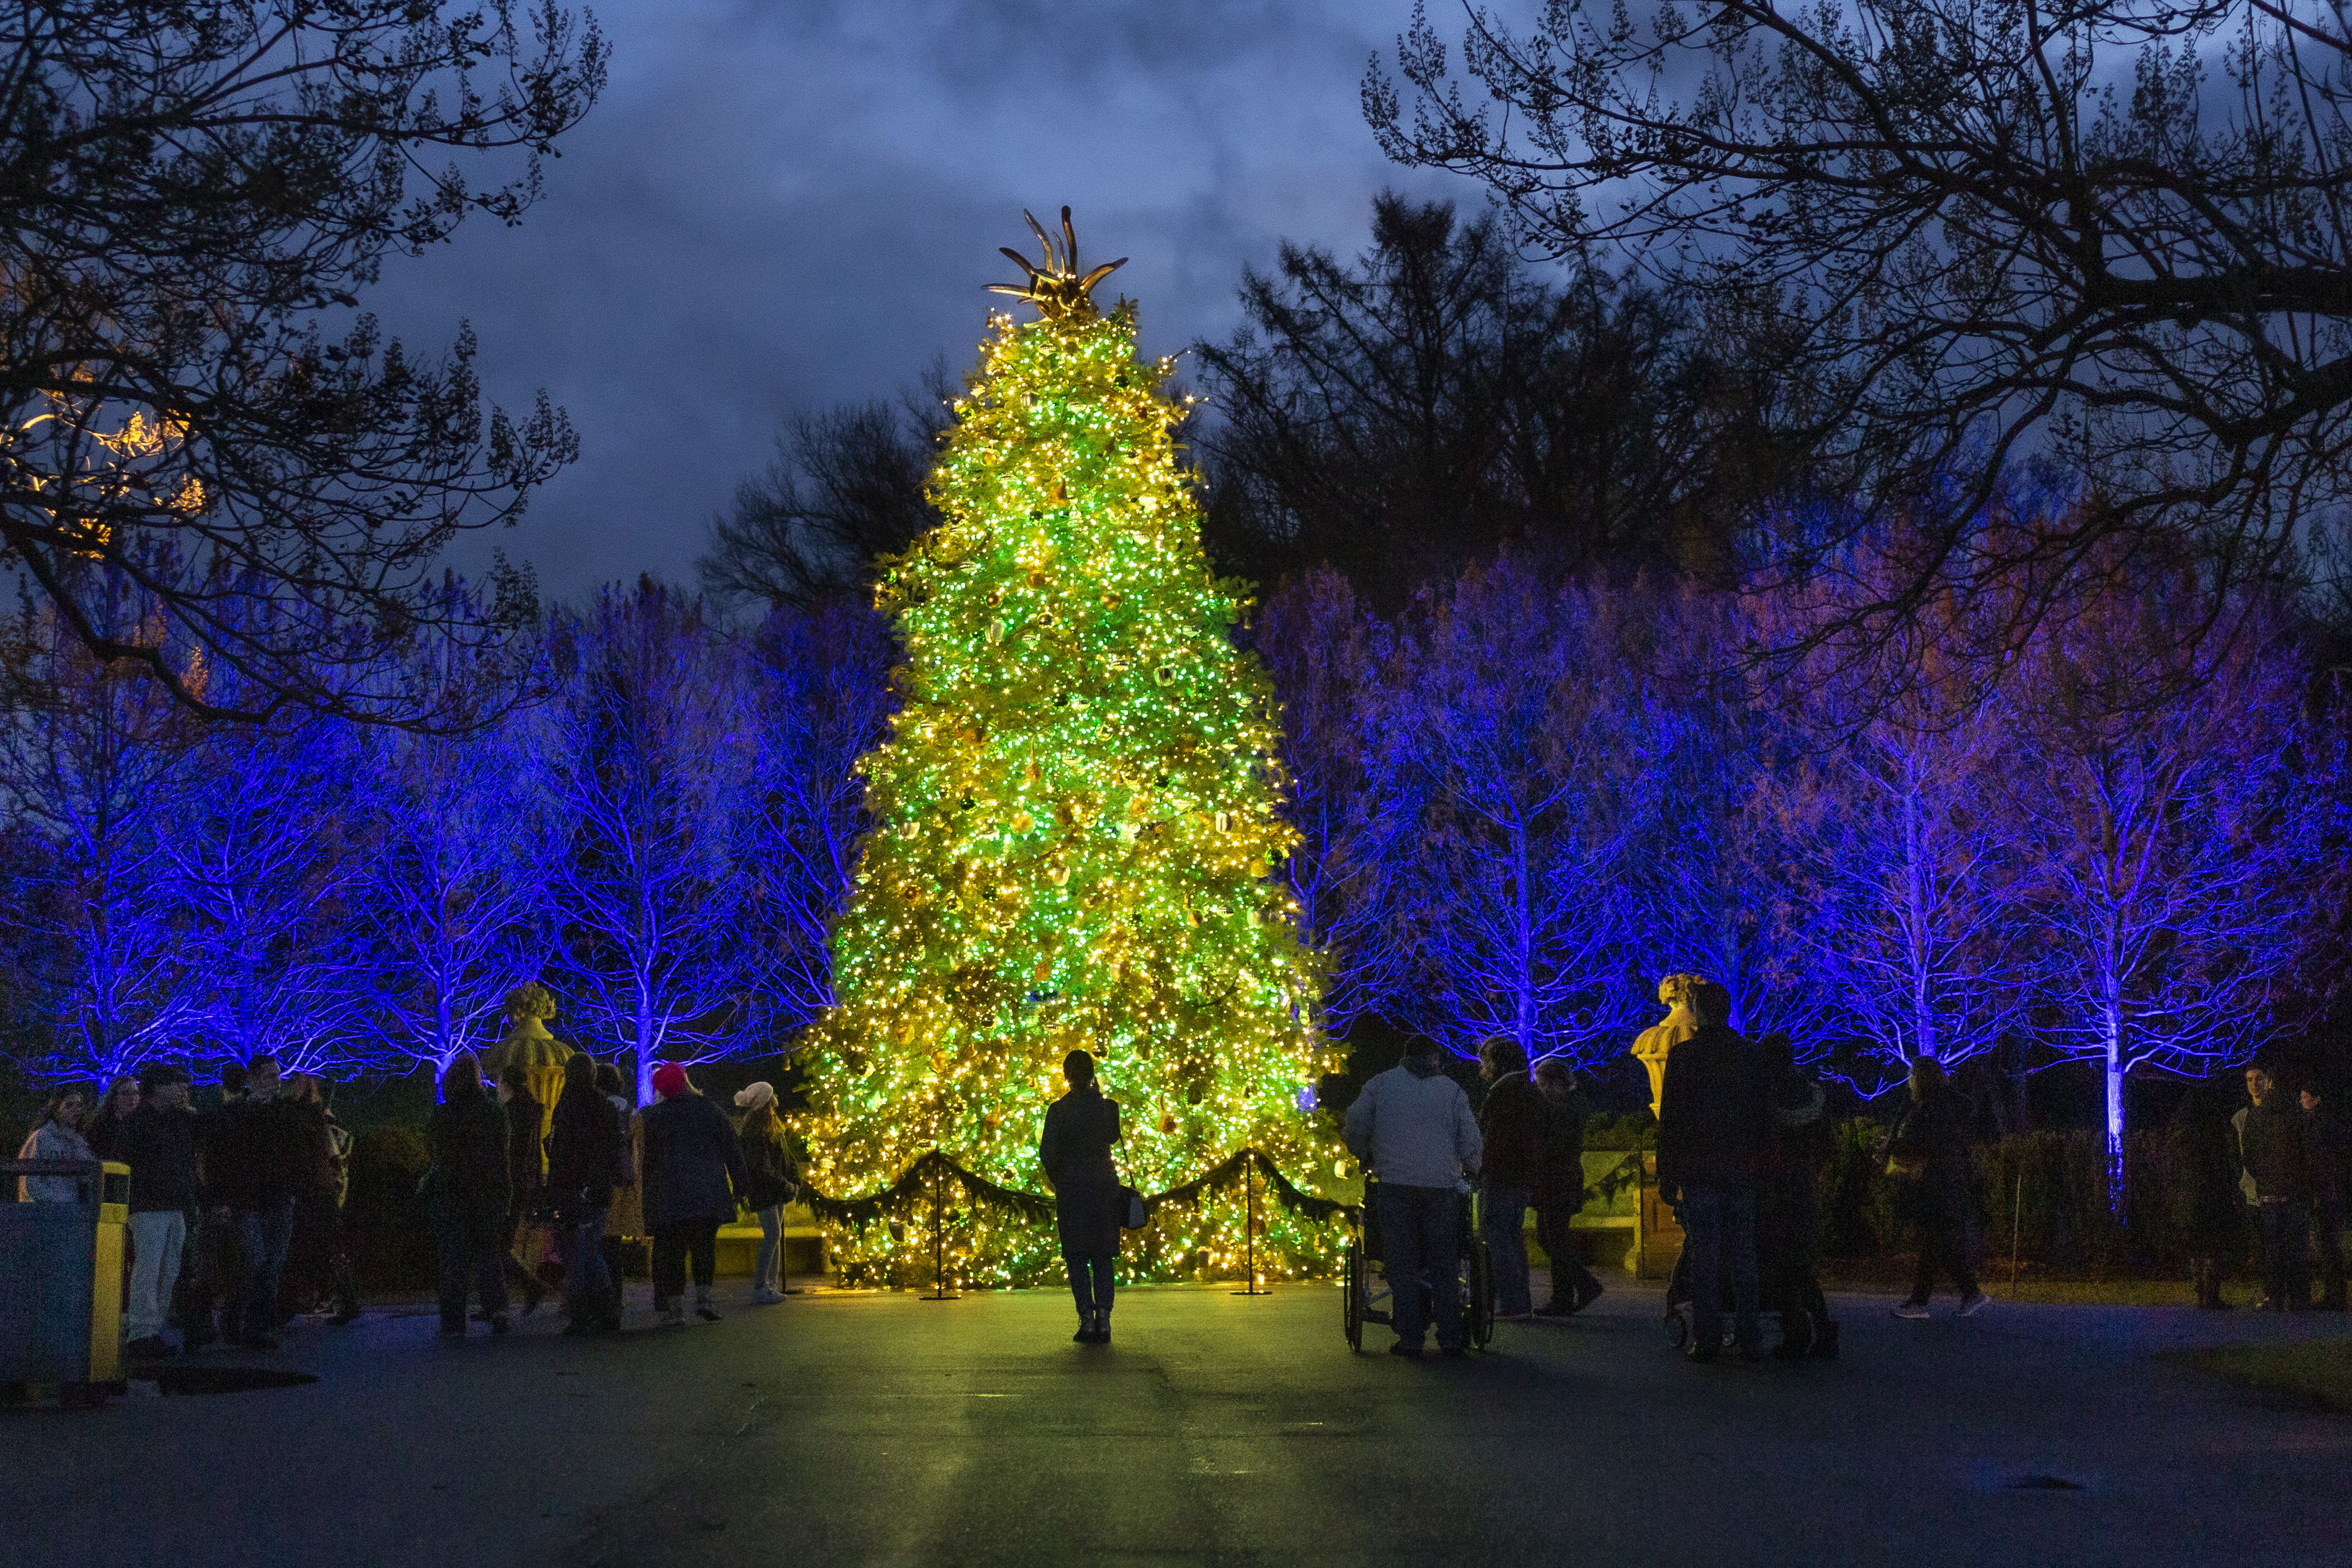 Pittston City Christmas Tree Lighting 2021 28 Of The Best Christmas Light Displays In Pennsylvania Pennlive Com